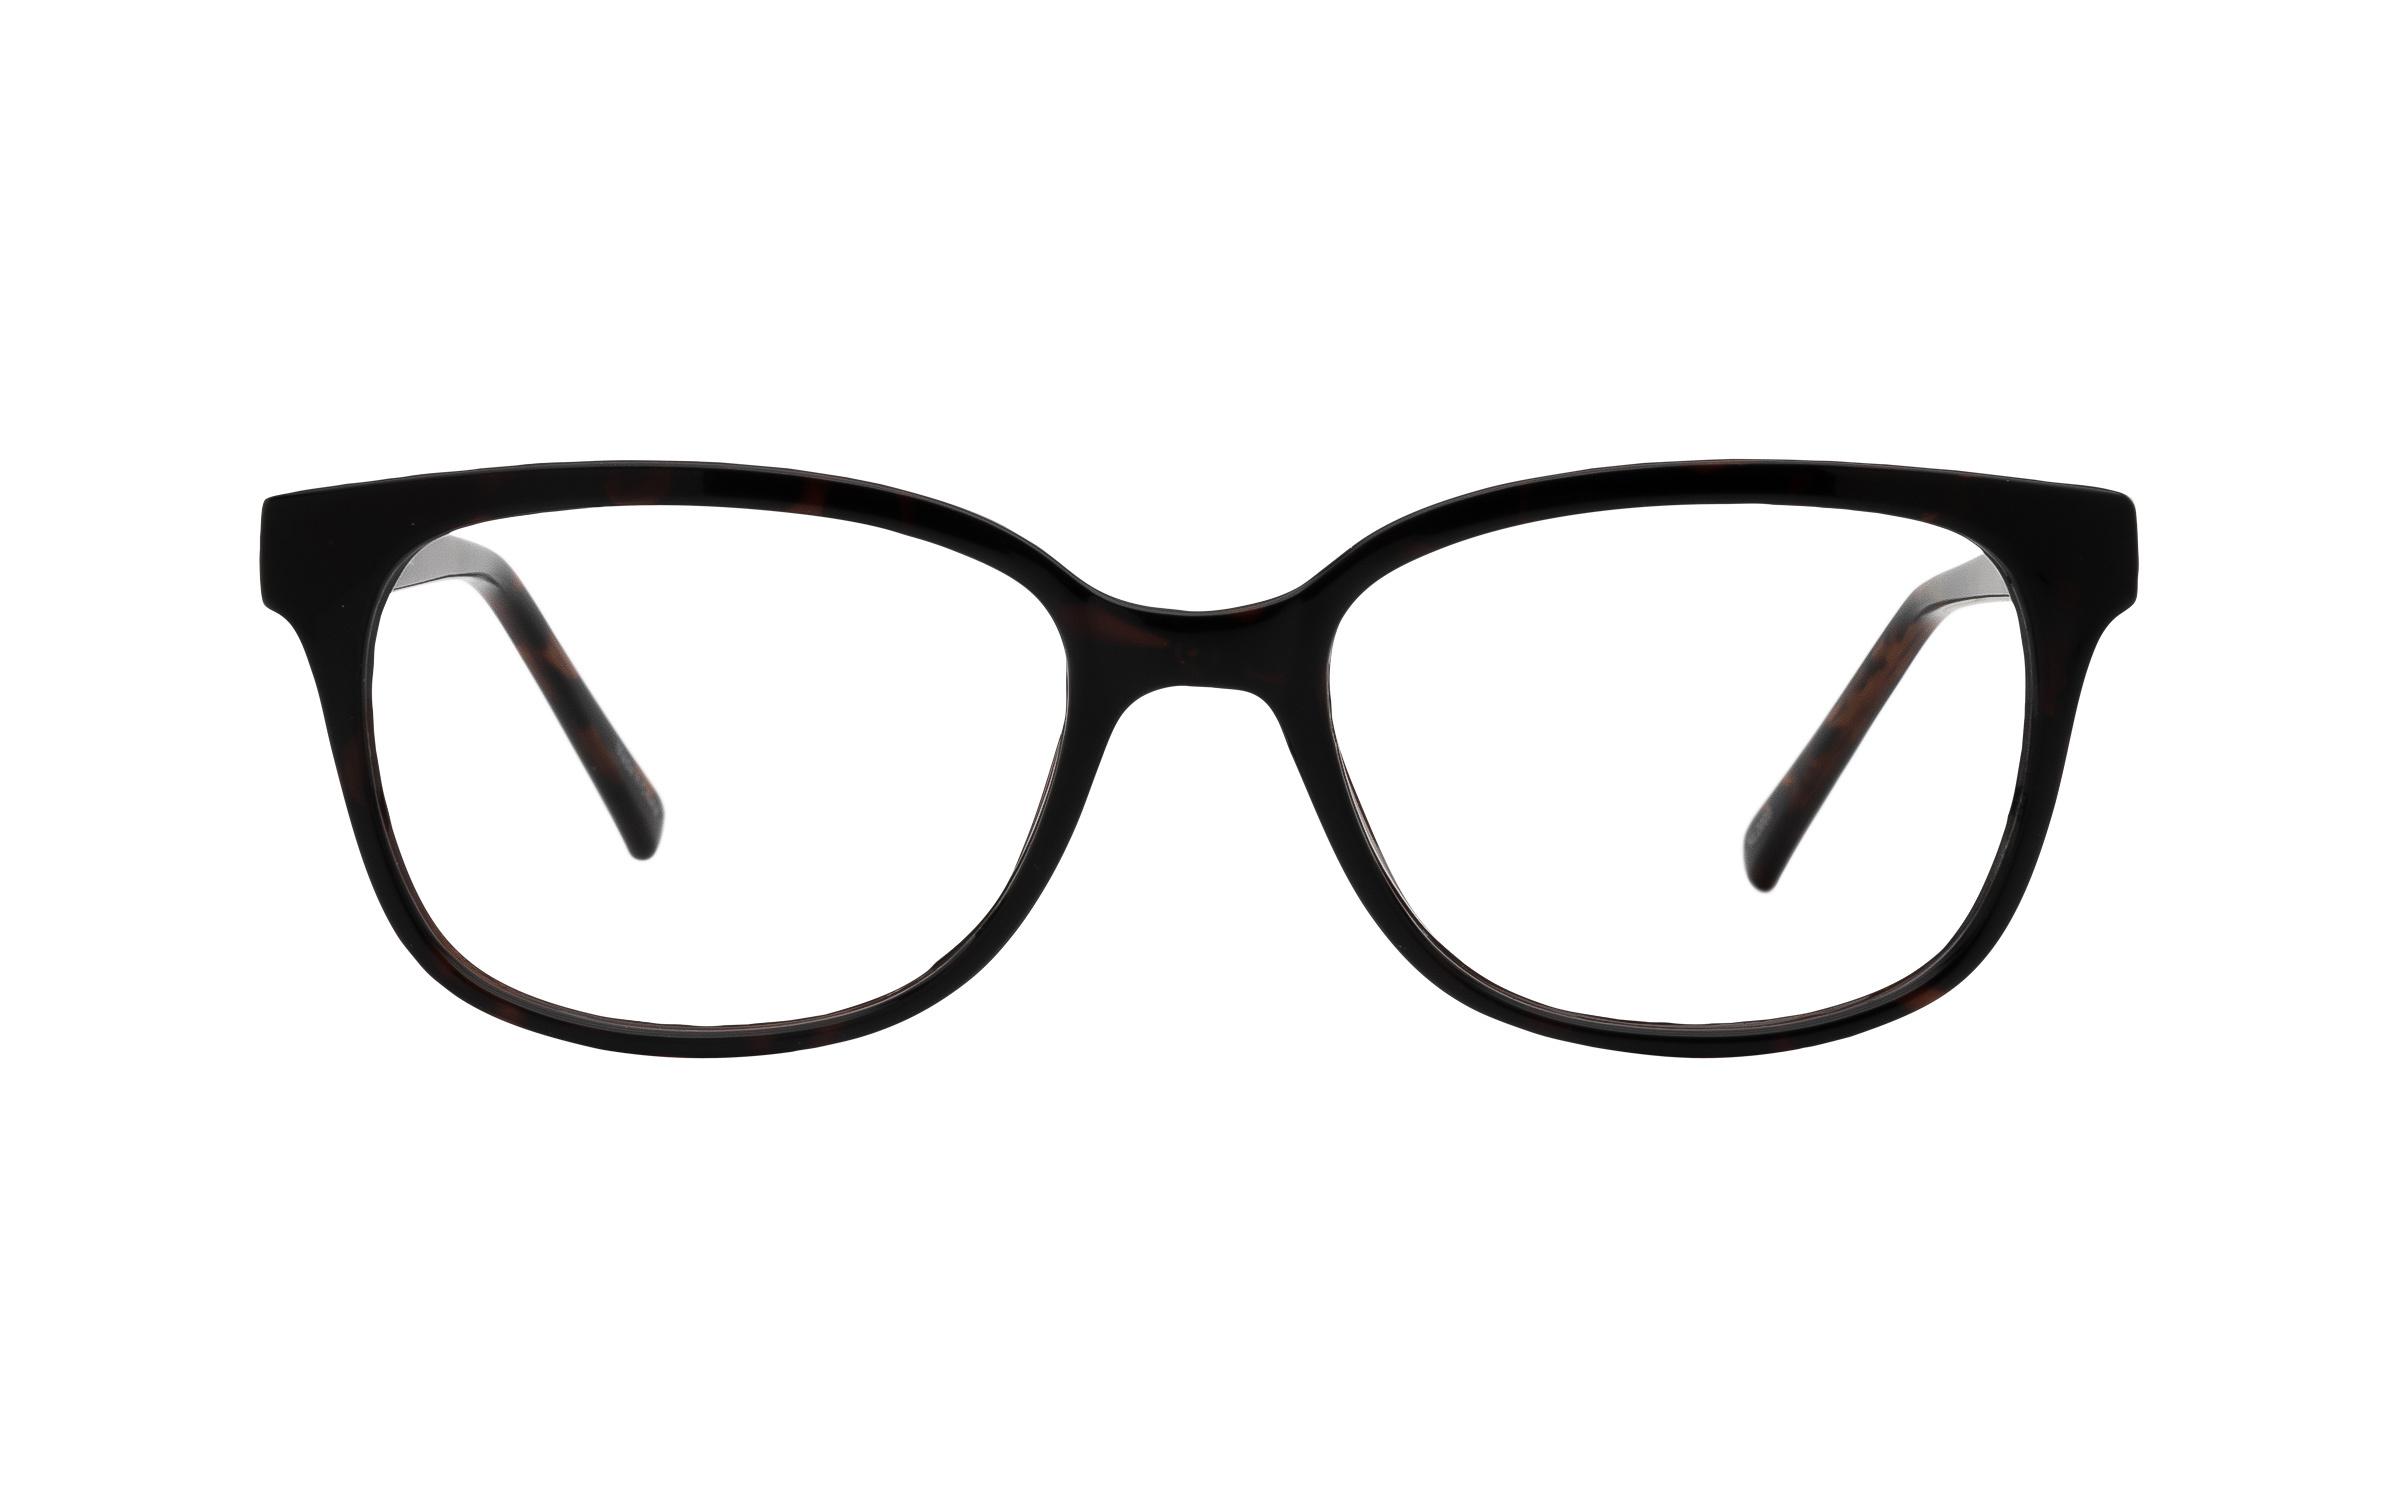 Clearly Basics Roggan River COL146 C02 (52) Eyeglasses and Frame in Dark Tortoise/Brown - Online Coastal